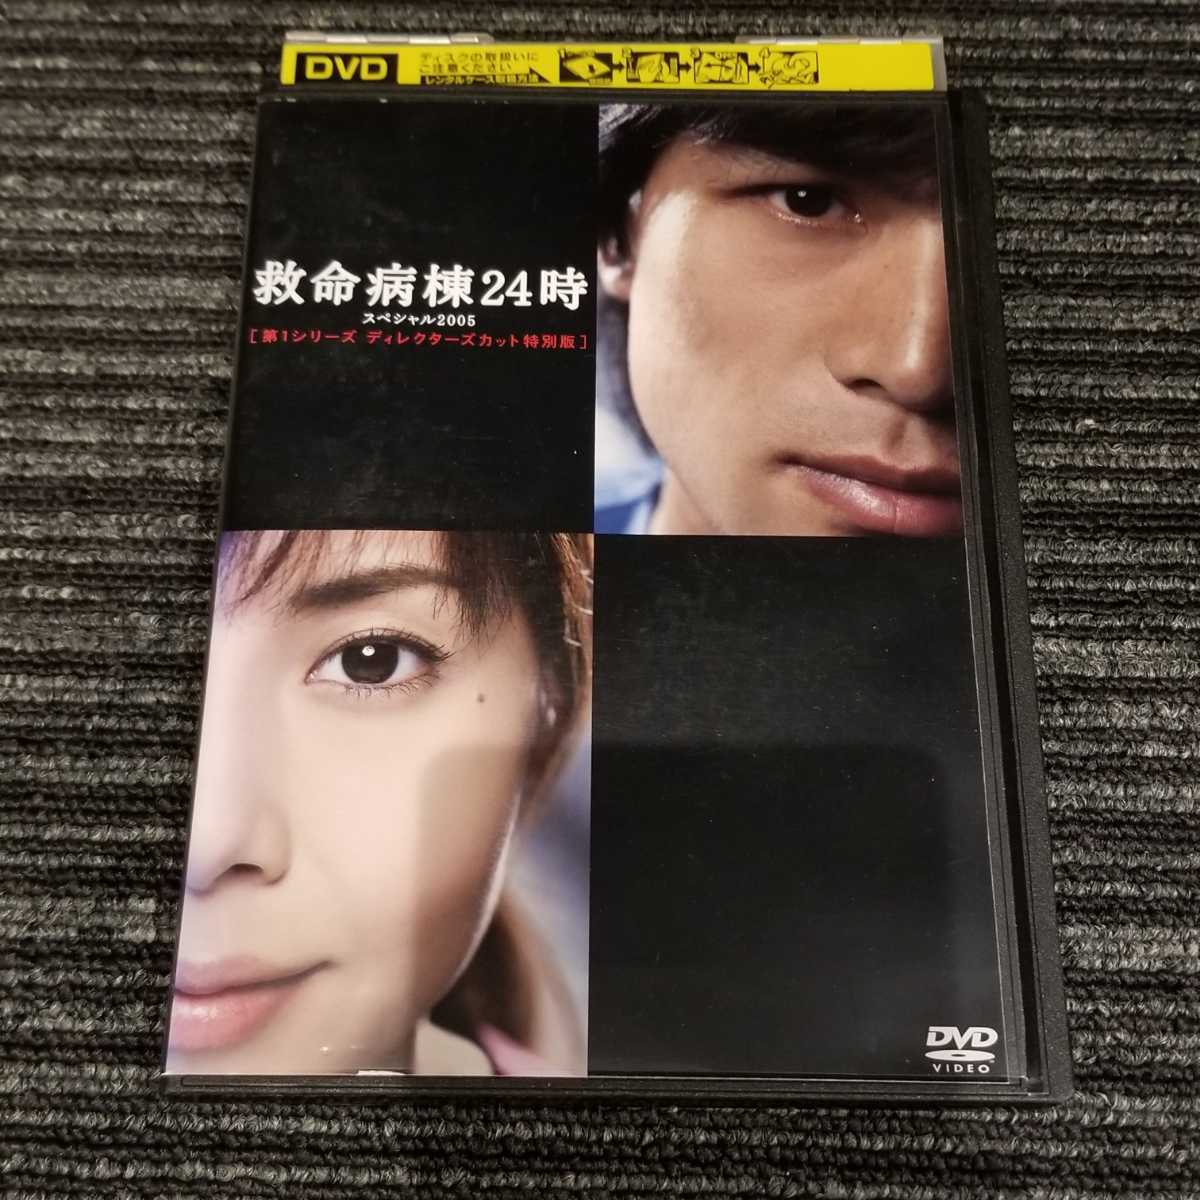 DVDソフト 救命病棟24時スペシャル2005 第1シリーズディレクターズカット特別版 レンタル落ち